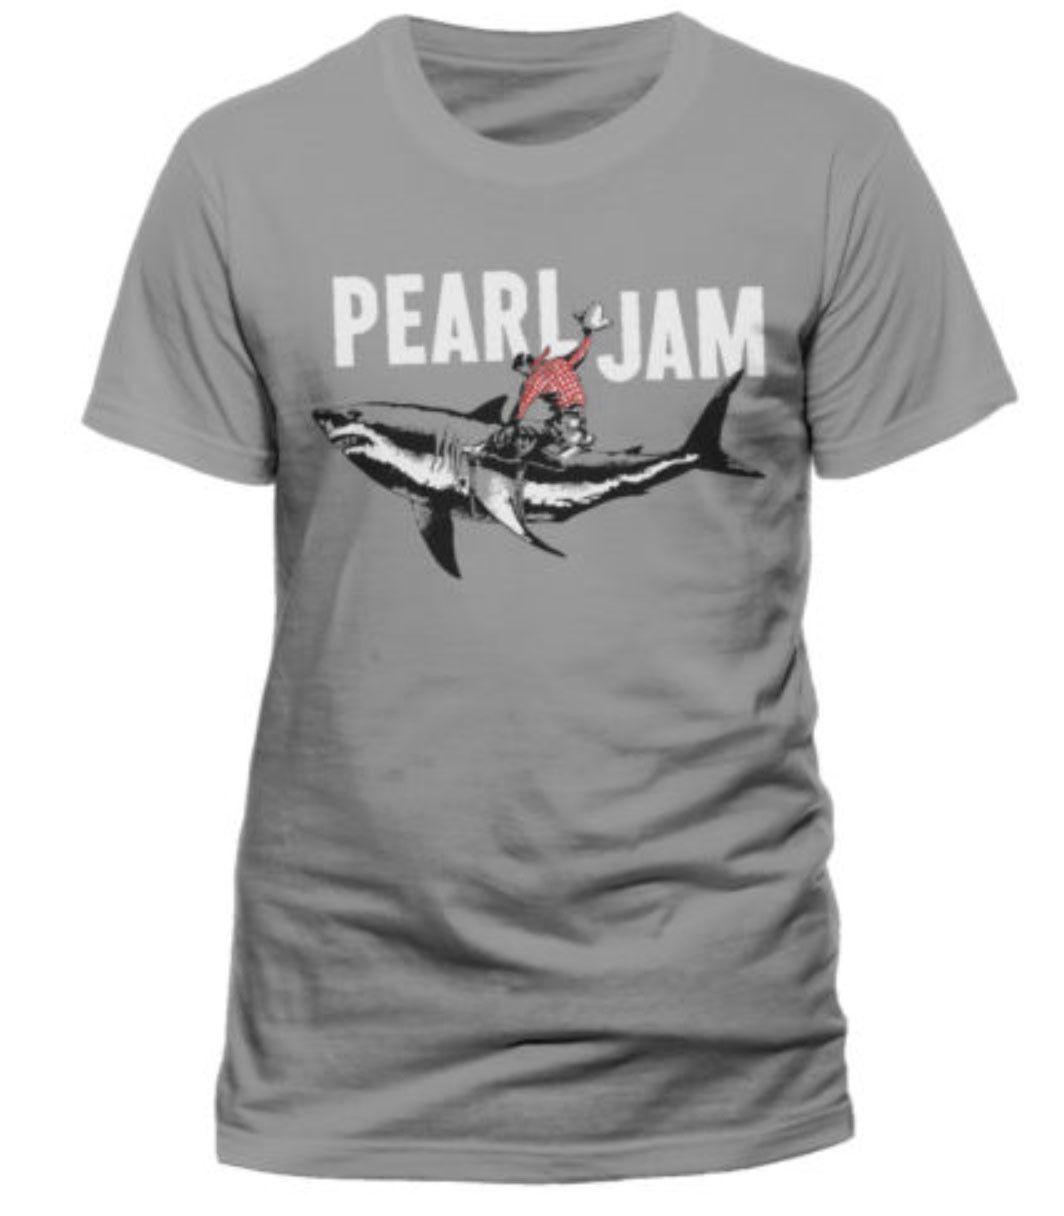 Men/'s Grey T-Shirt US IMPORT Shark Cowboy Pearl Jam